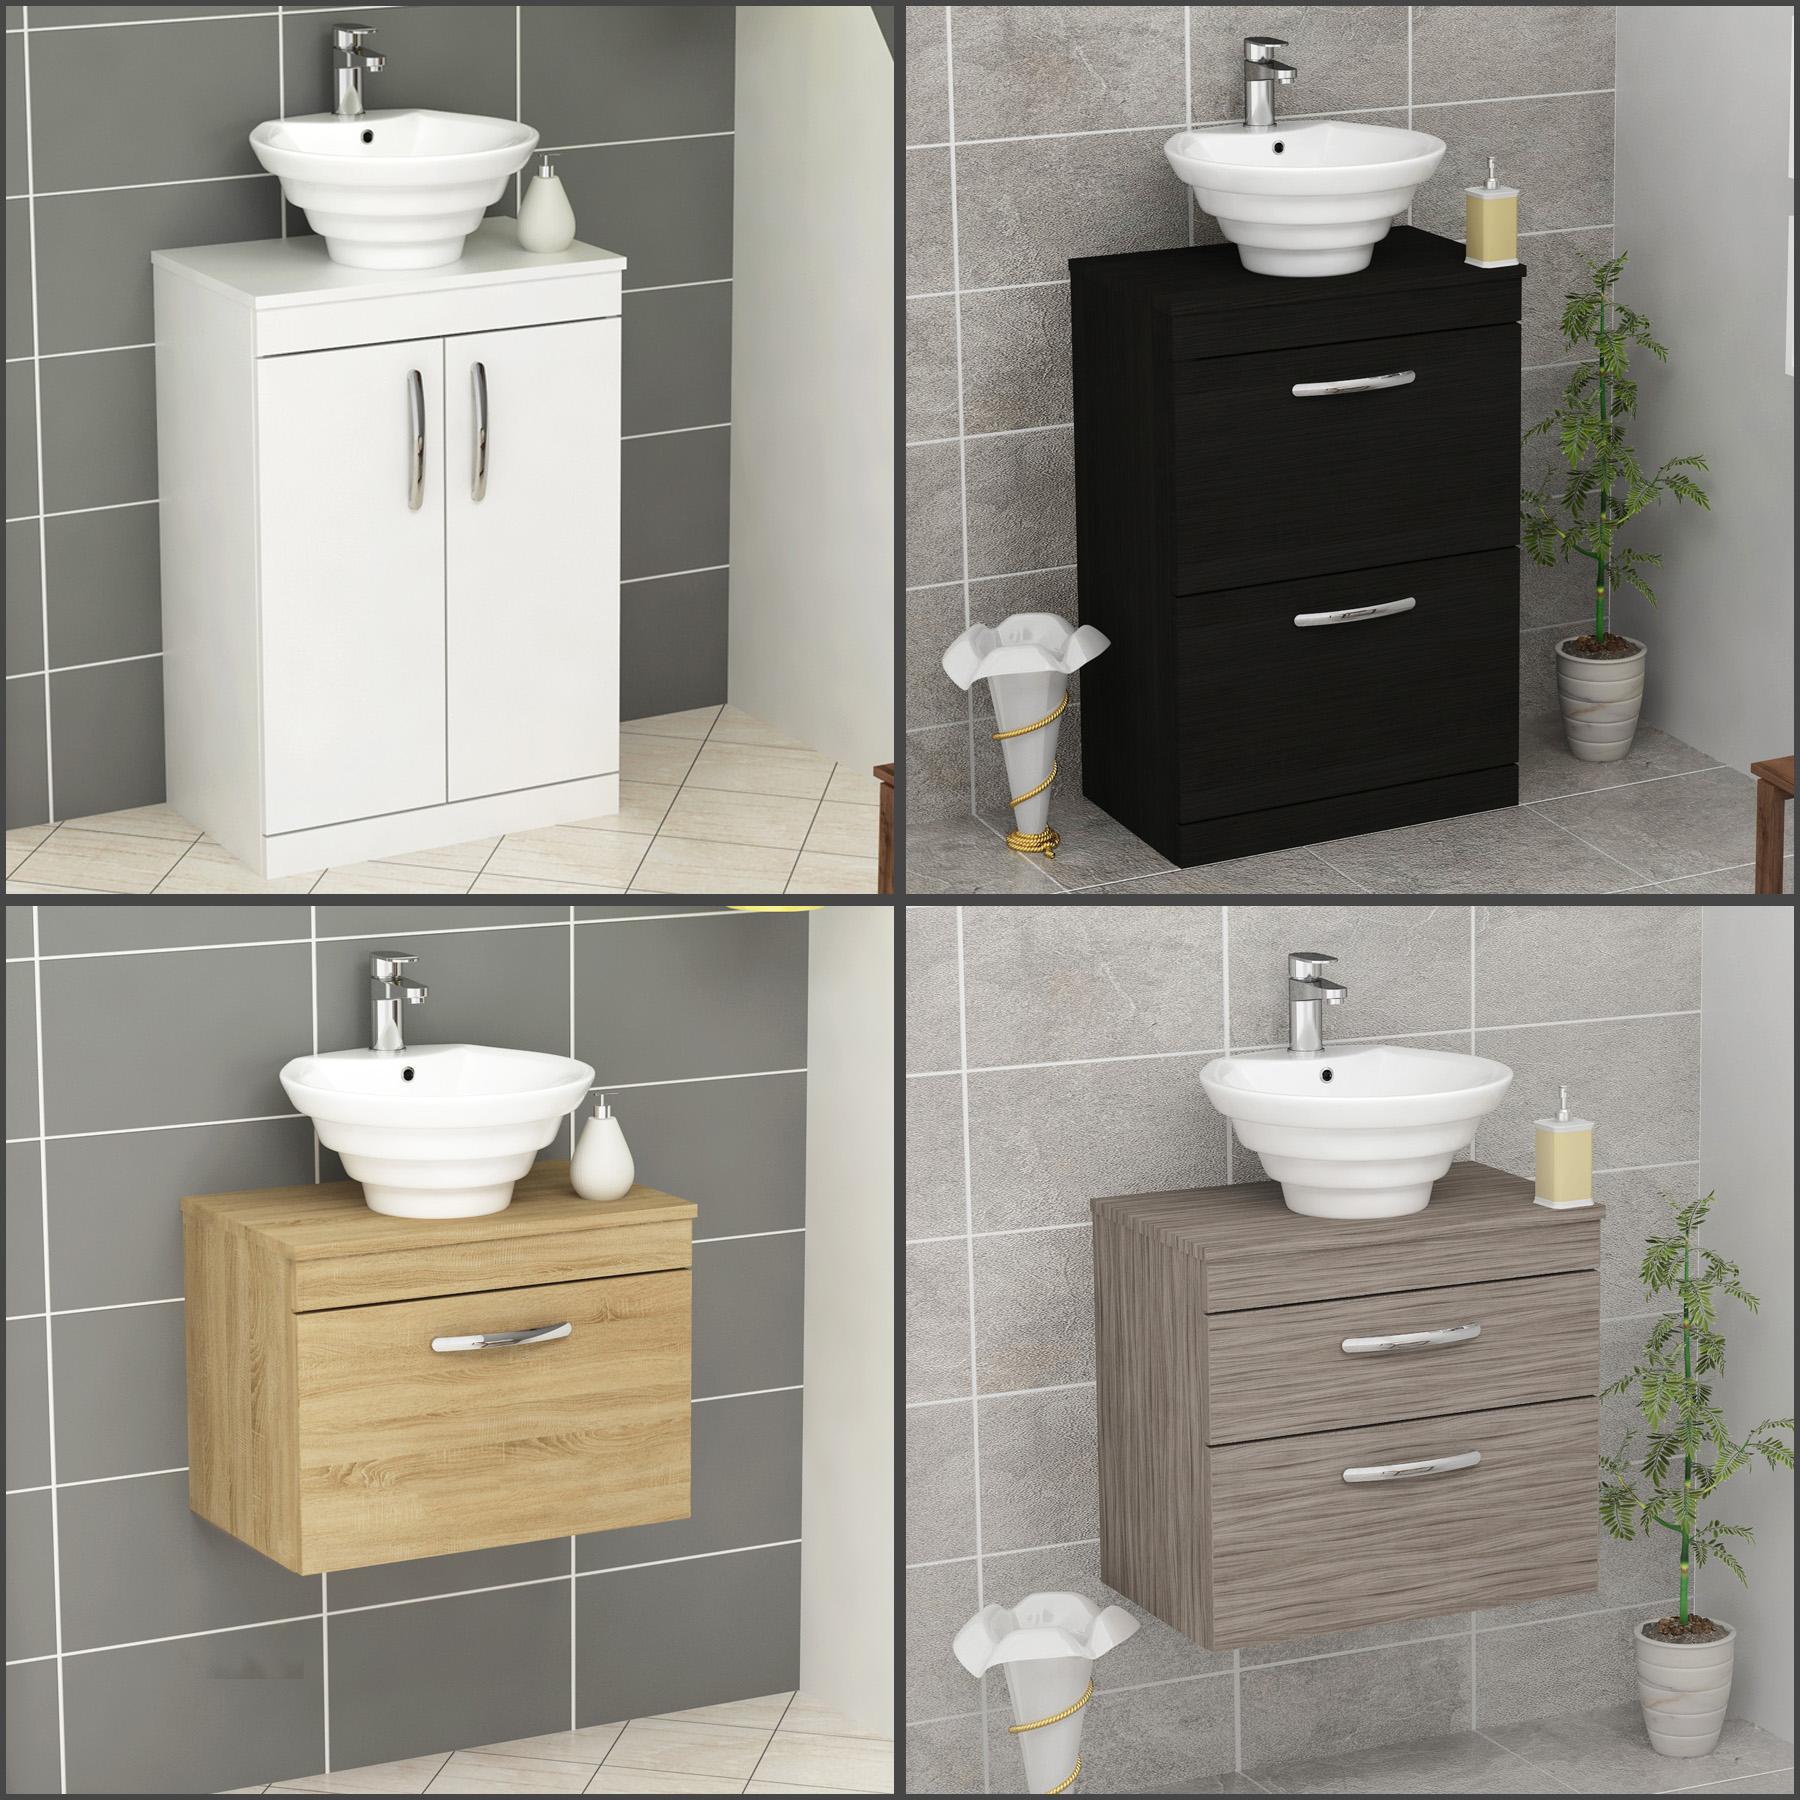 Bathroom Vanity Unit Cabinet Storage Countertop Worktop Basin Sink